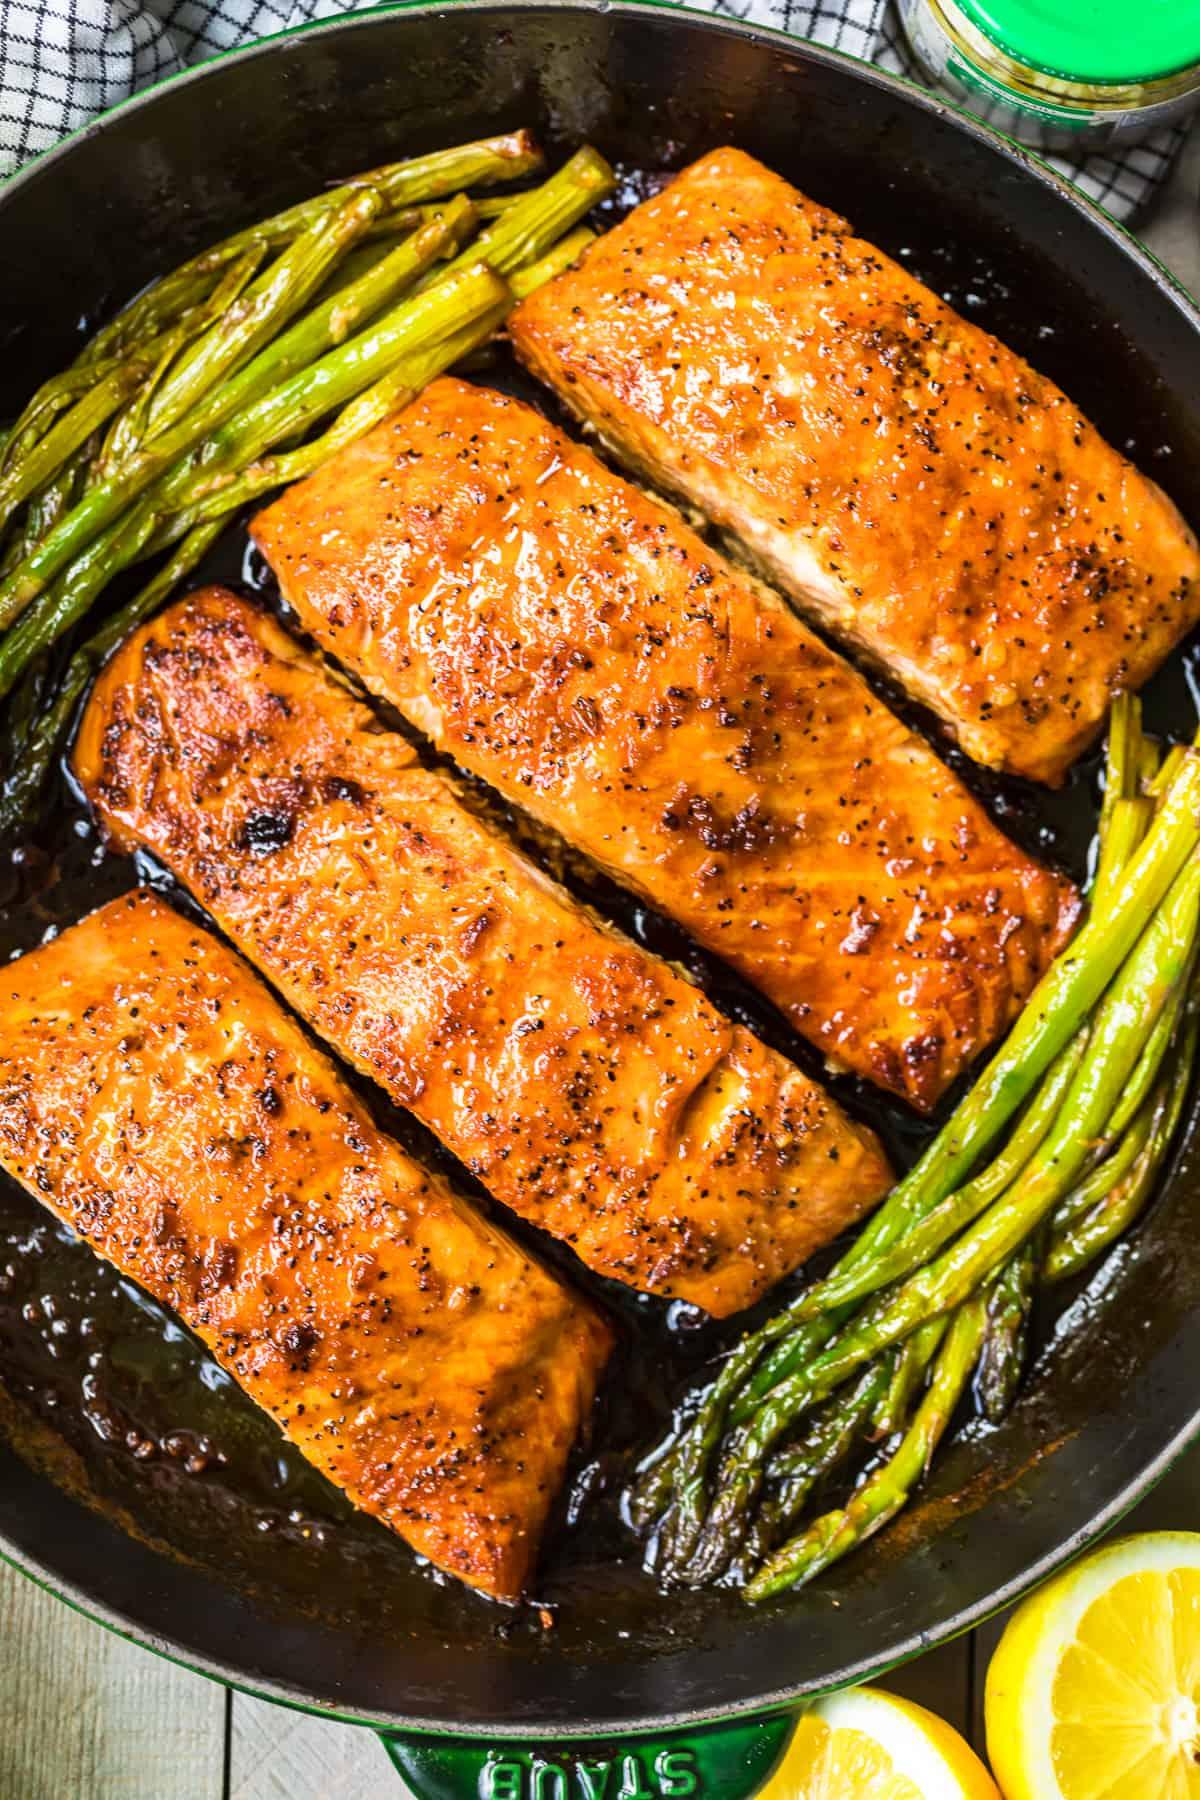 Honey Garlic Salmon and Asparagus